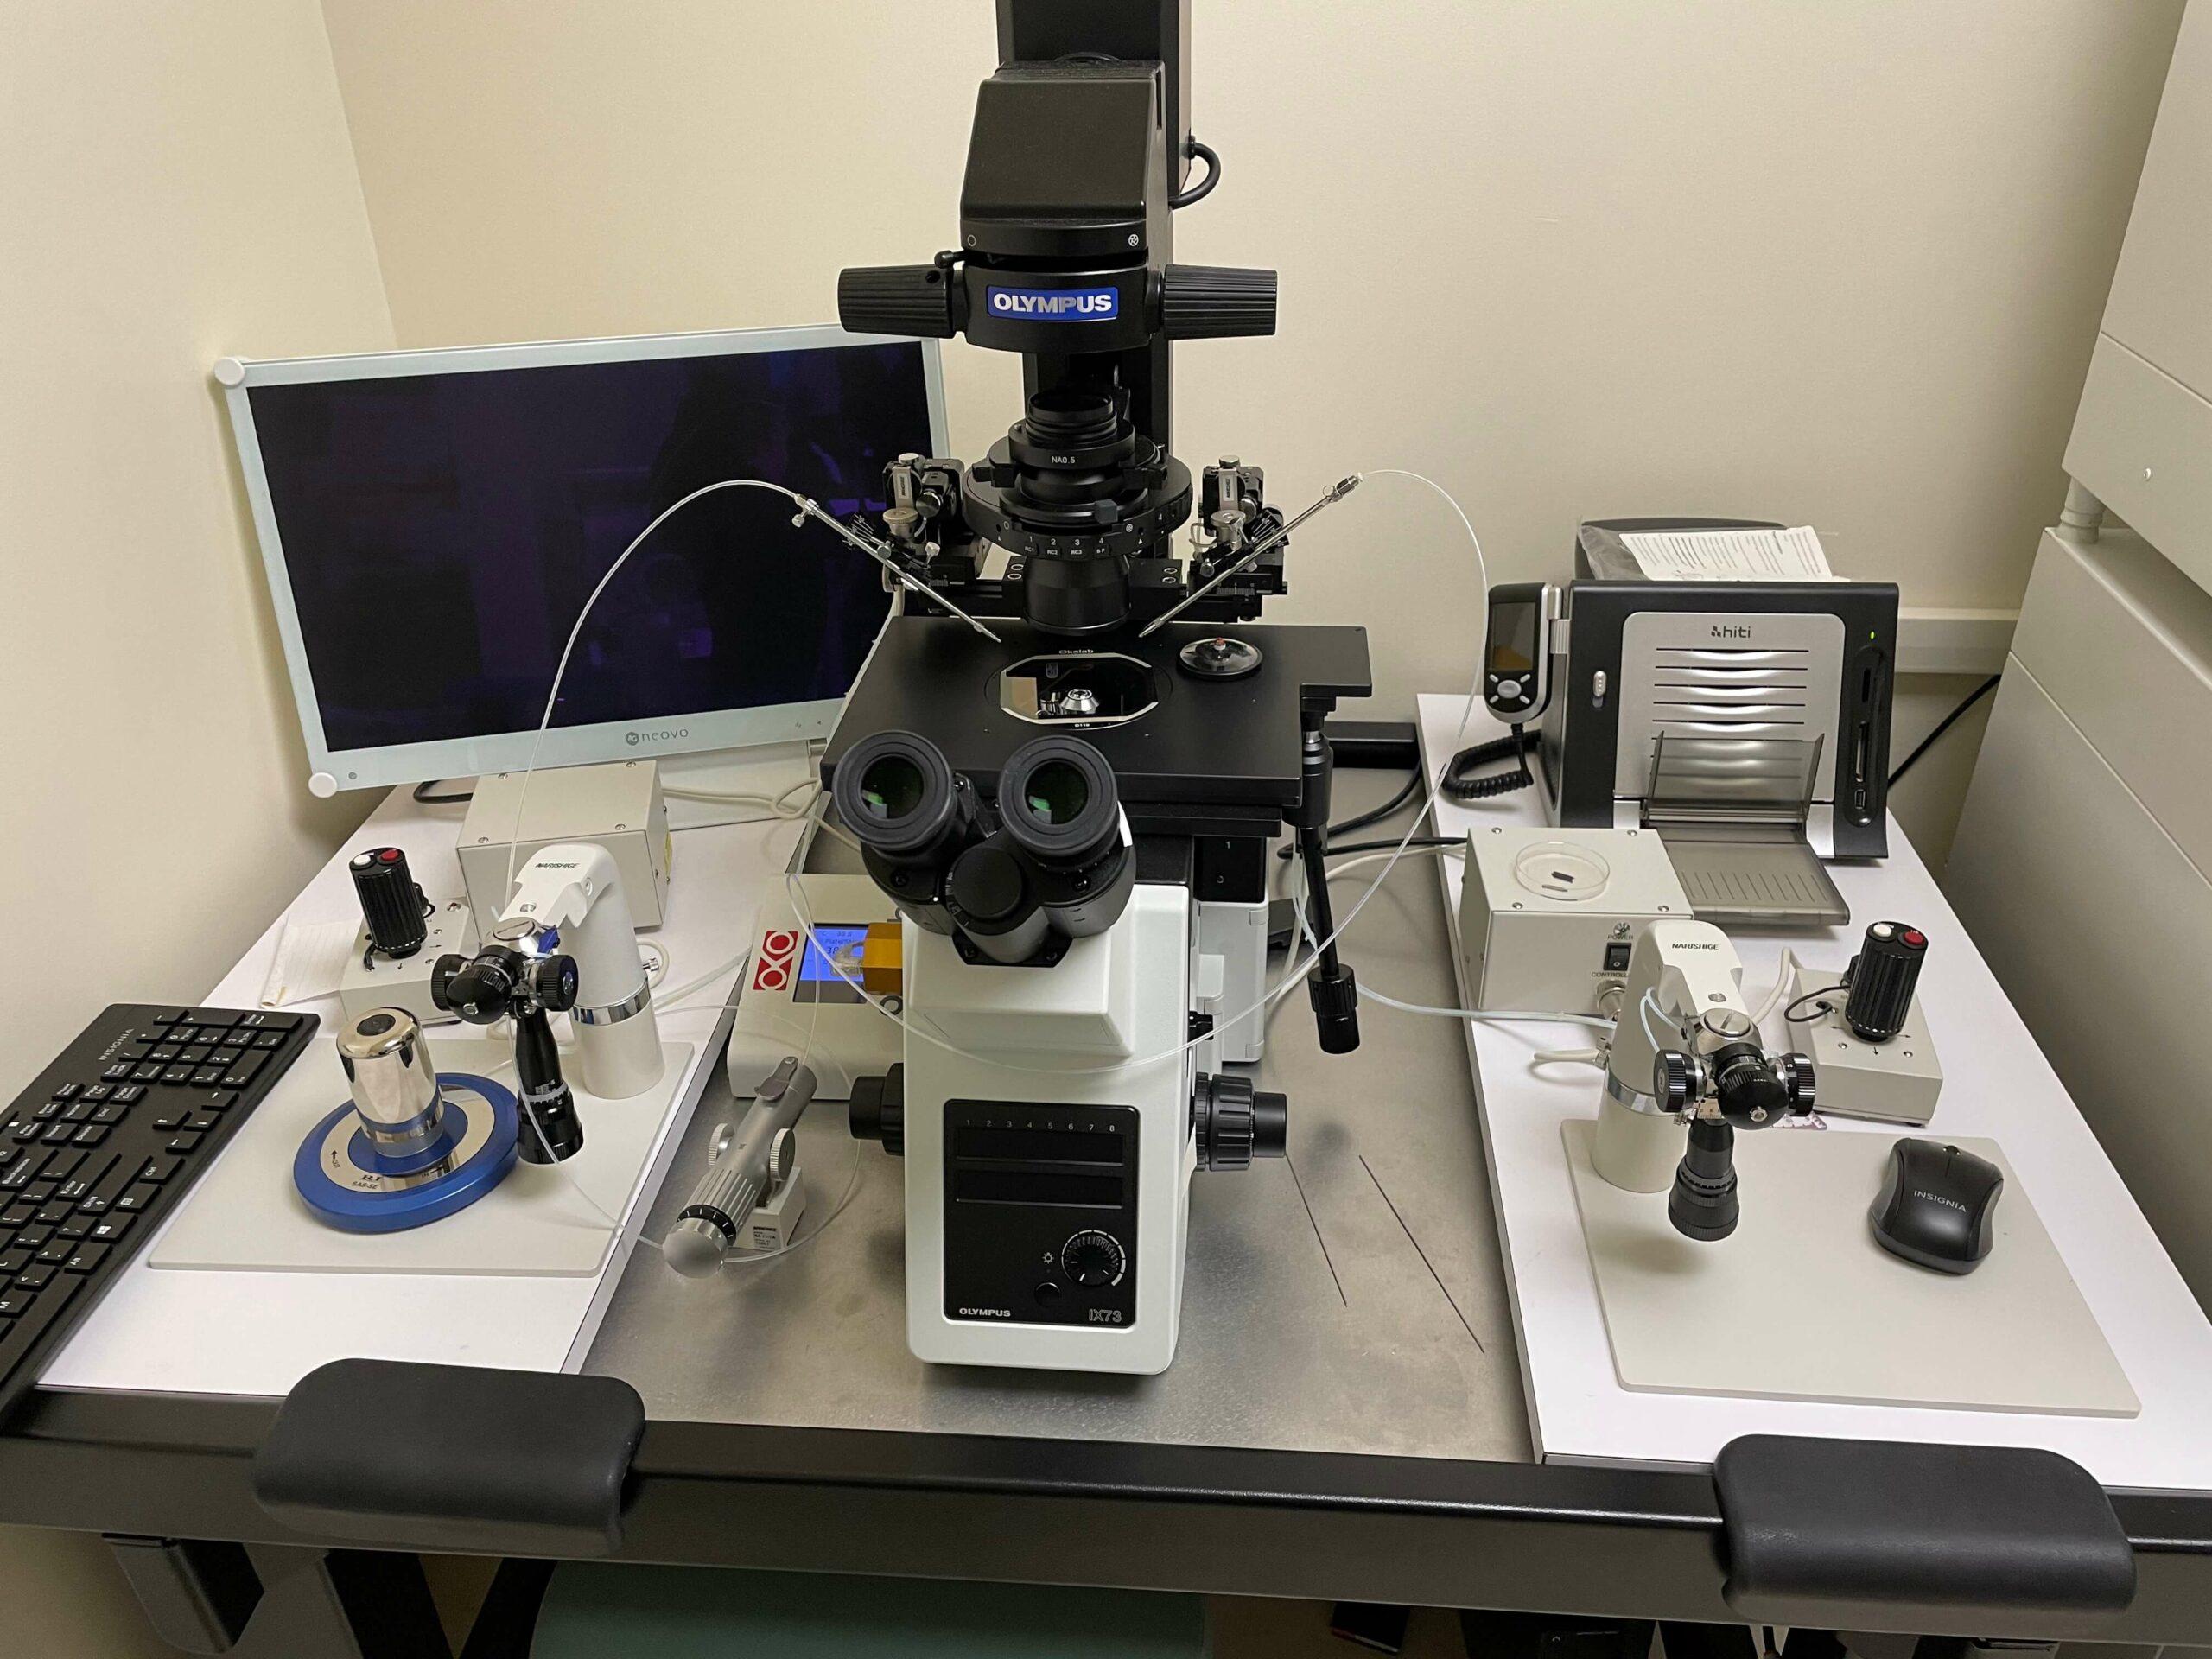 Fertility clinic equipment